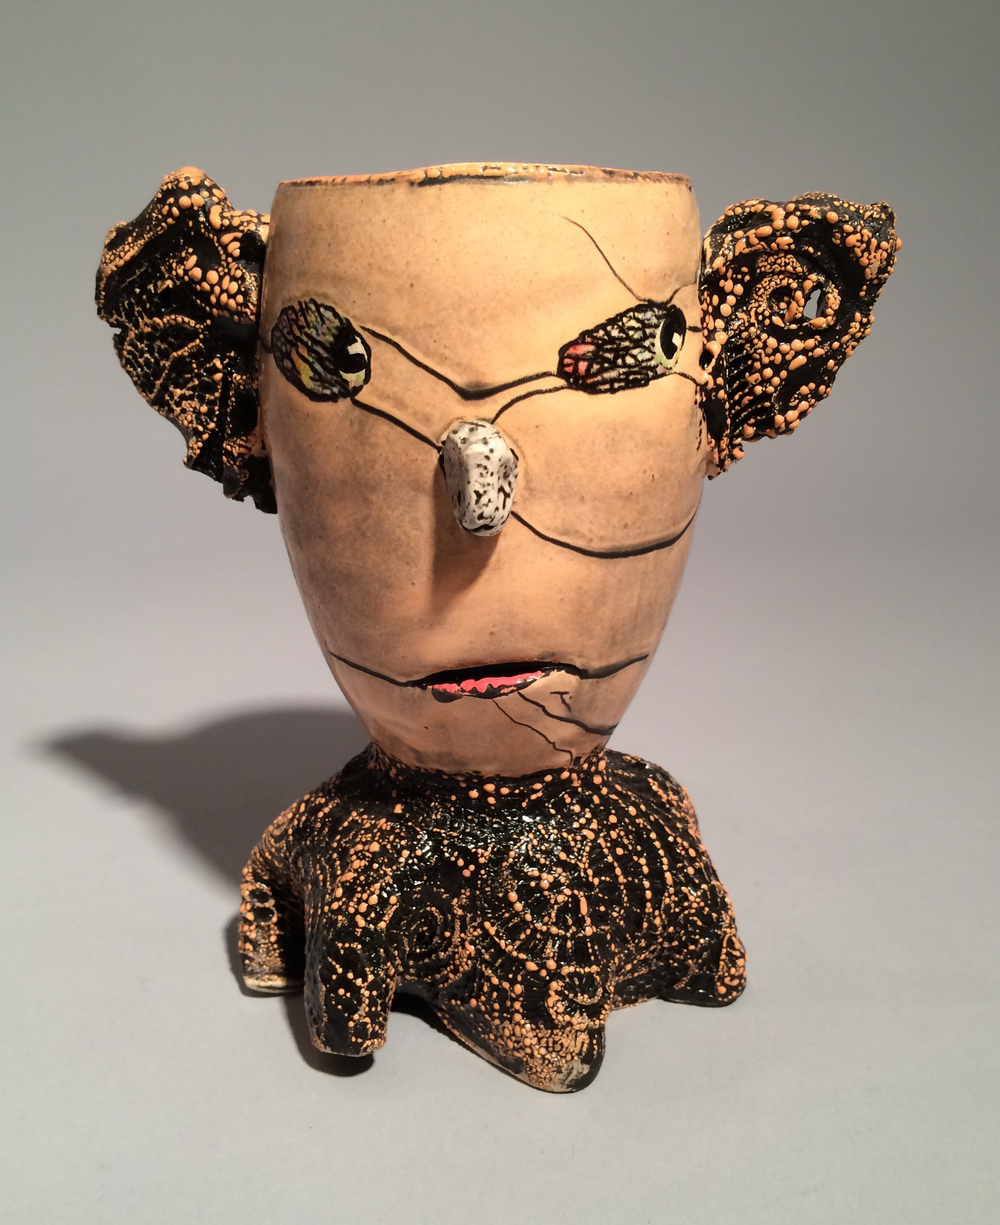 Andy Nasisse, Peach Cup, ceramic, Sherrie Gallerie